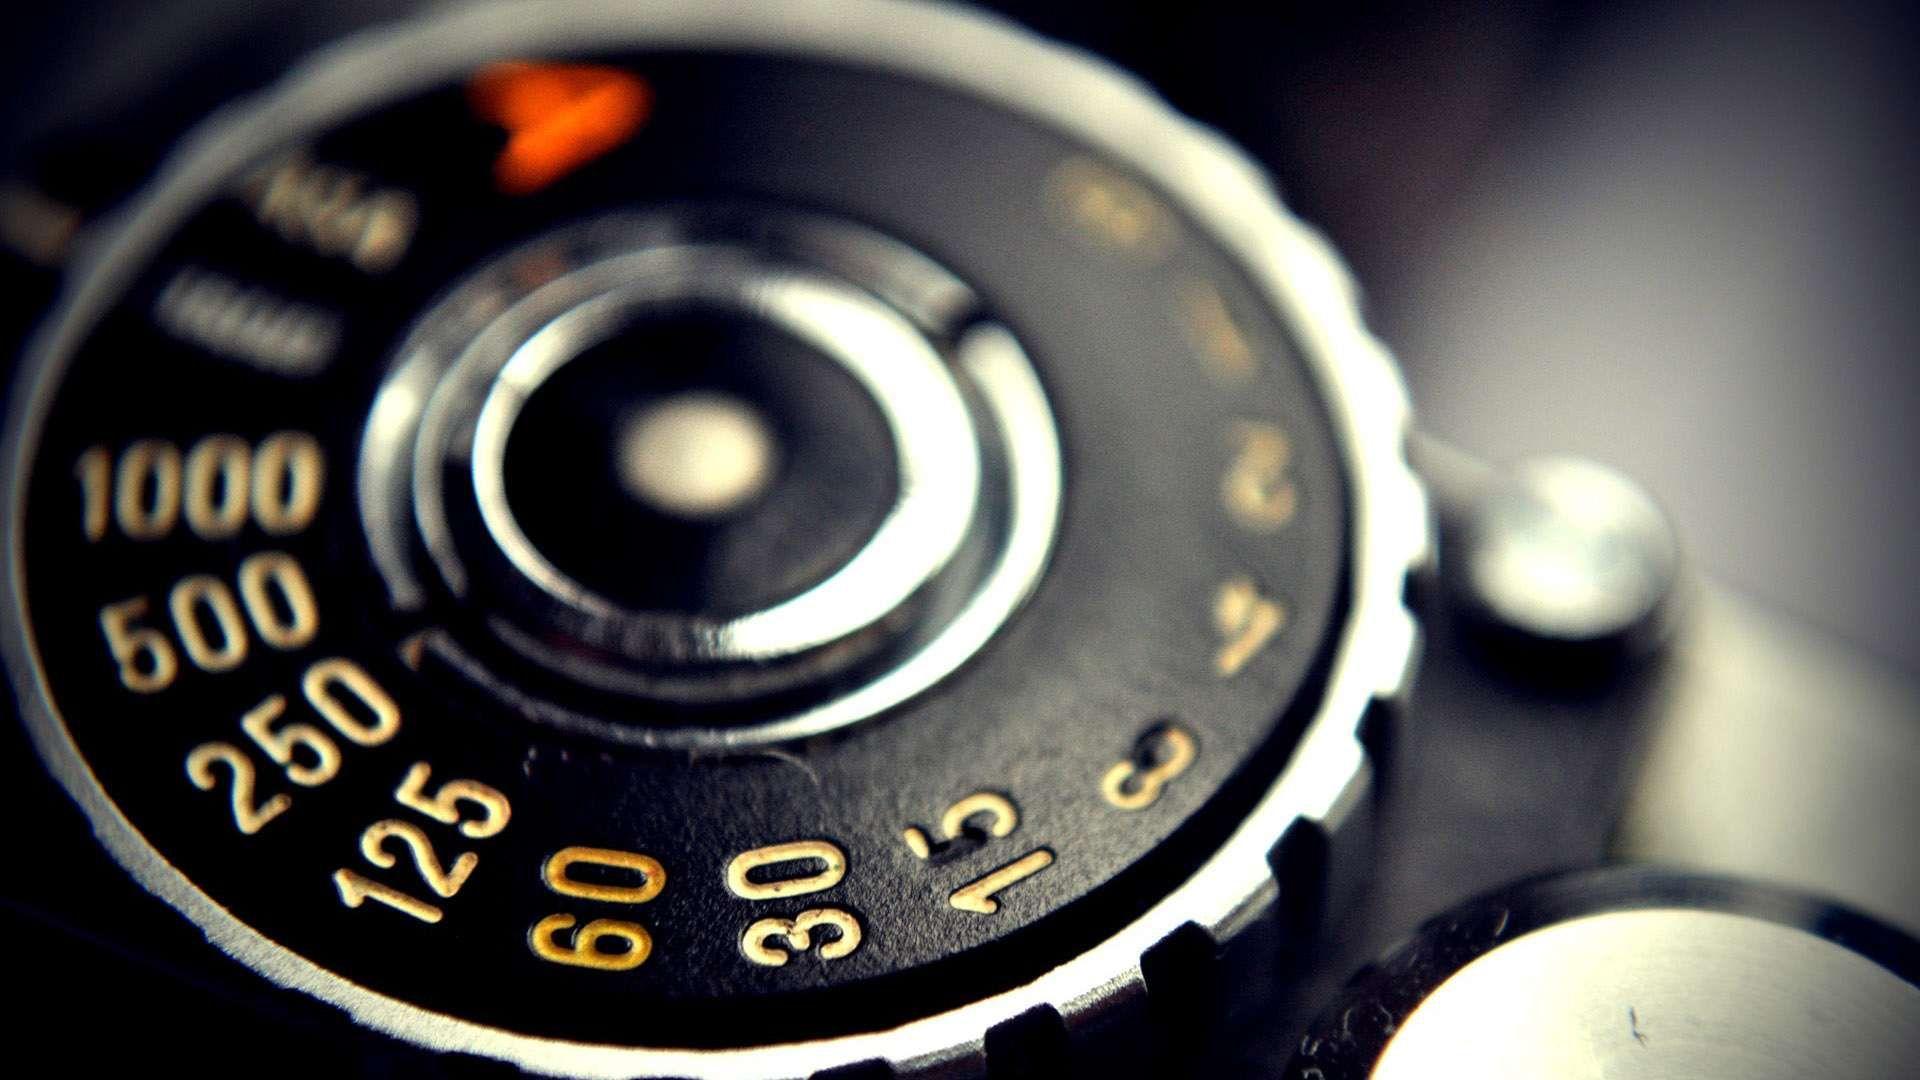 leica mode dial - http://www.fullhdwpp/gadgets/leica-mode-dial